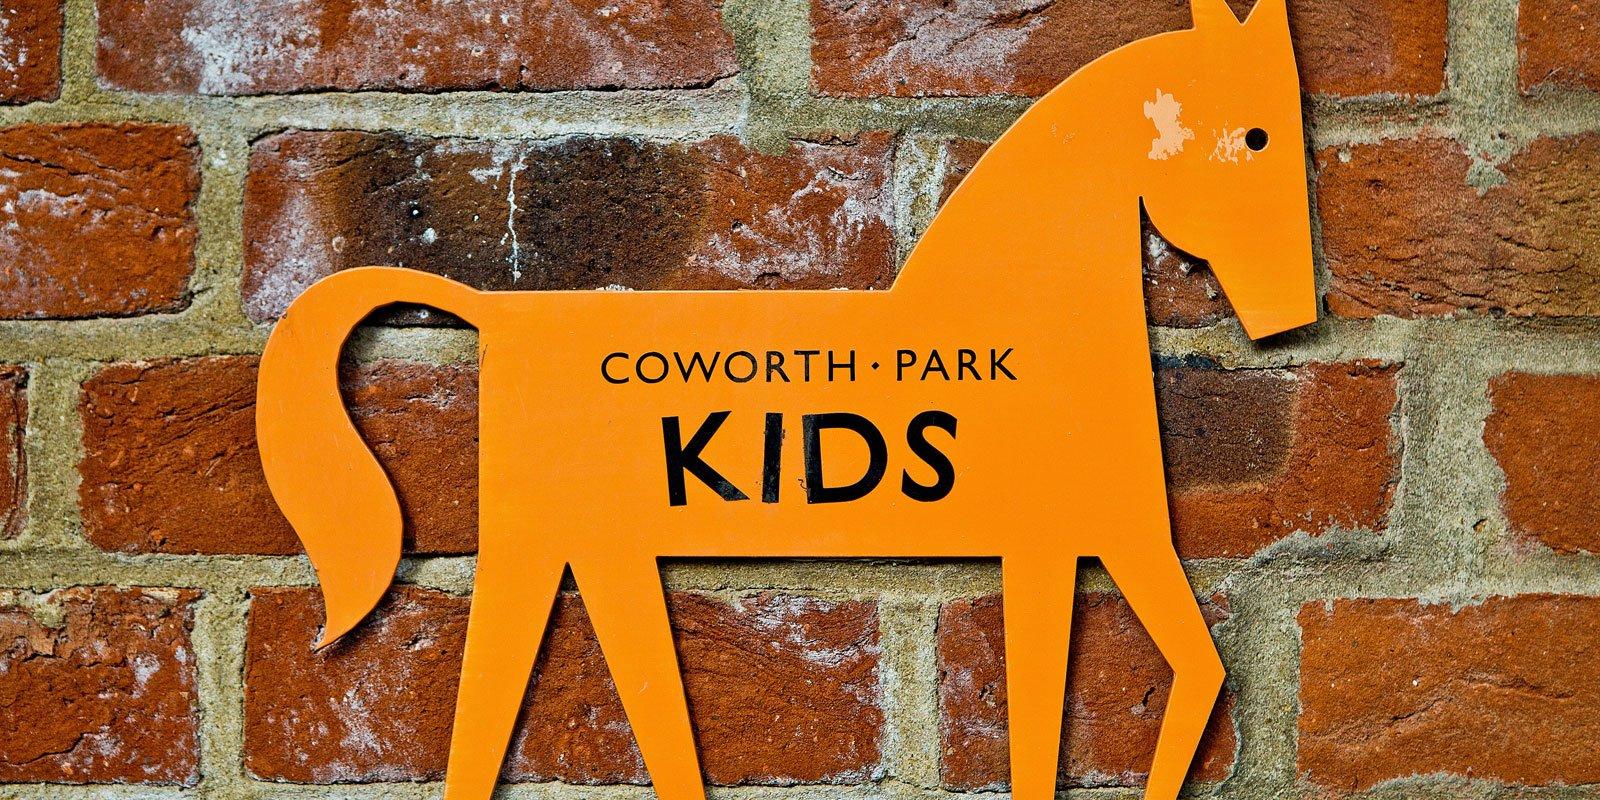 Coworth Park Kids Club Sign